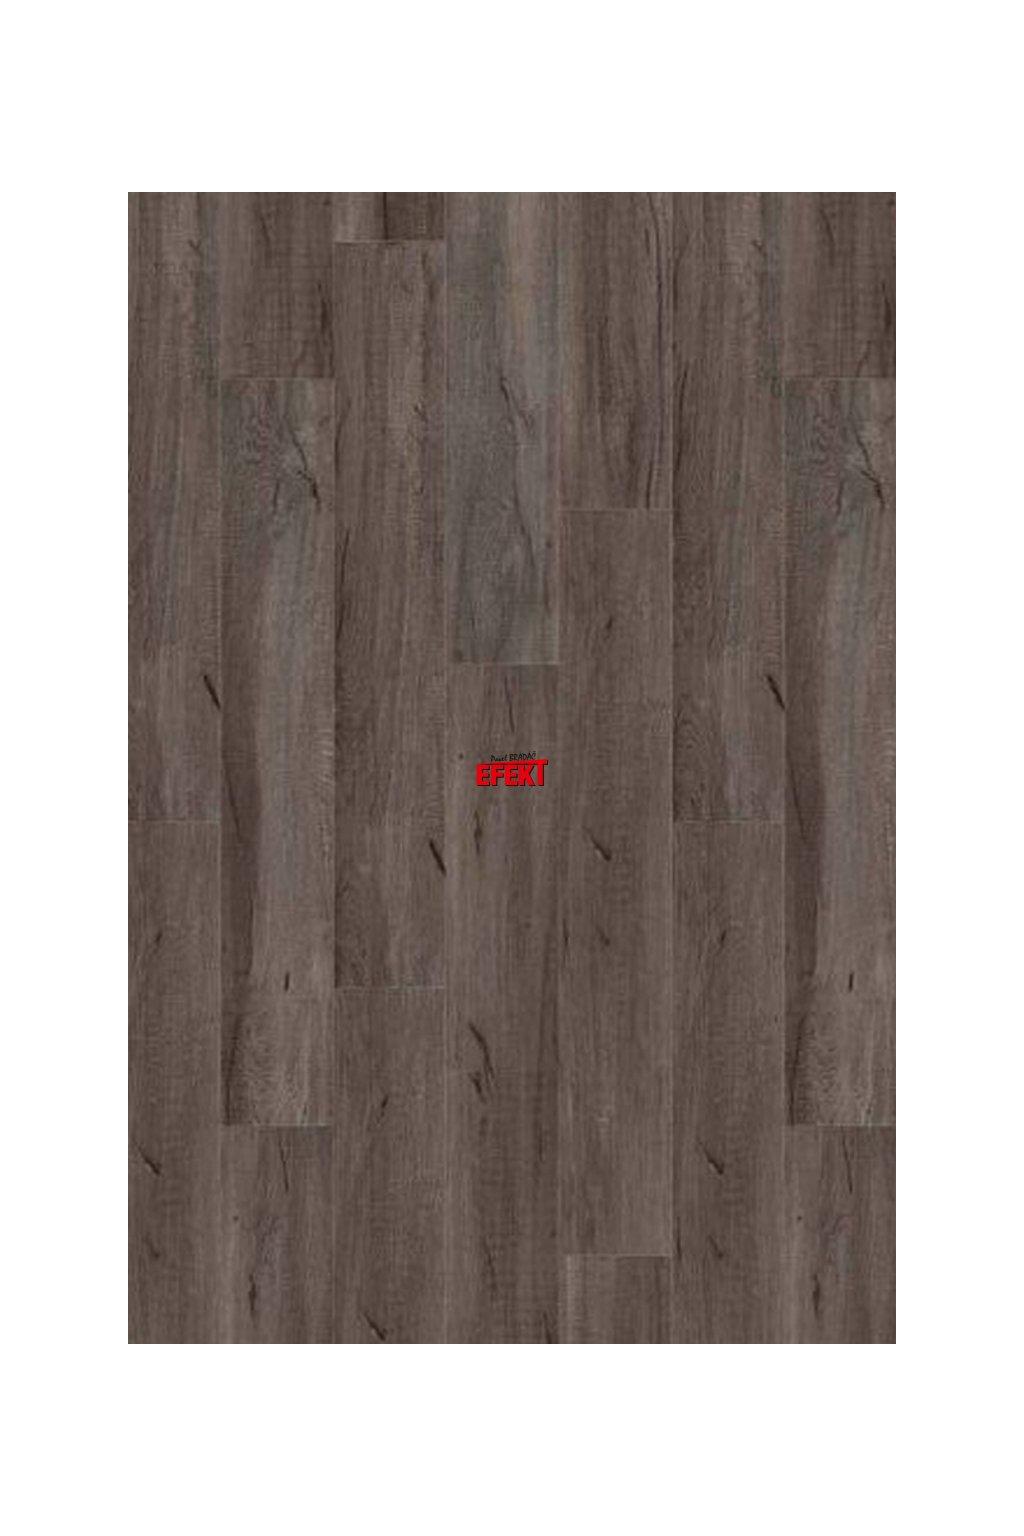 Gerflor Clic 55 Swiss Oak Smoked